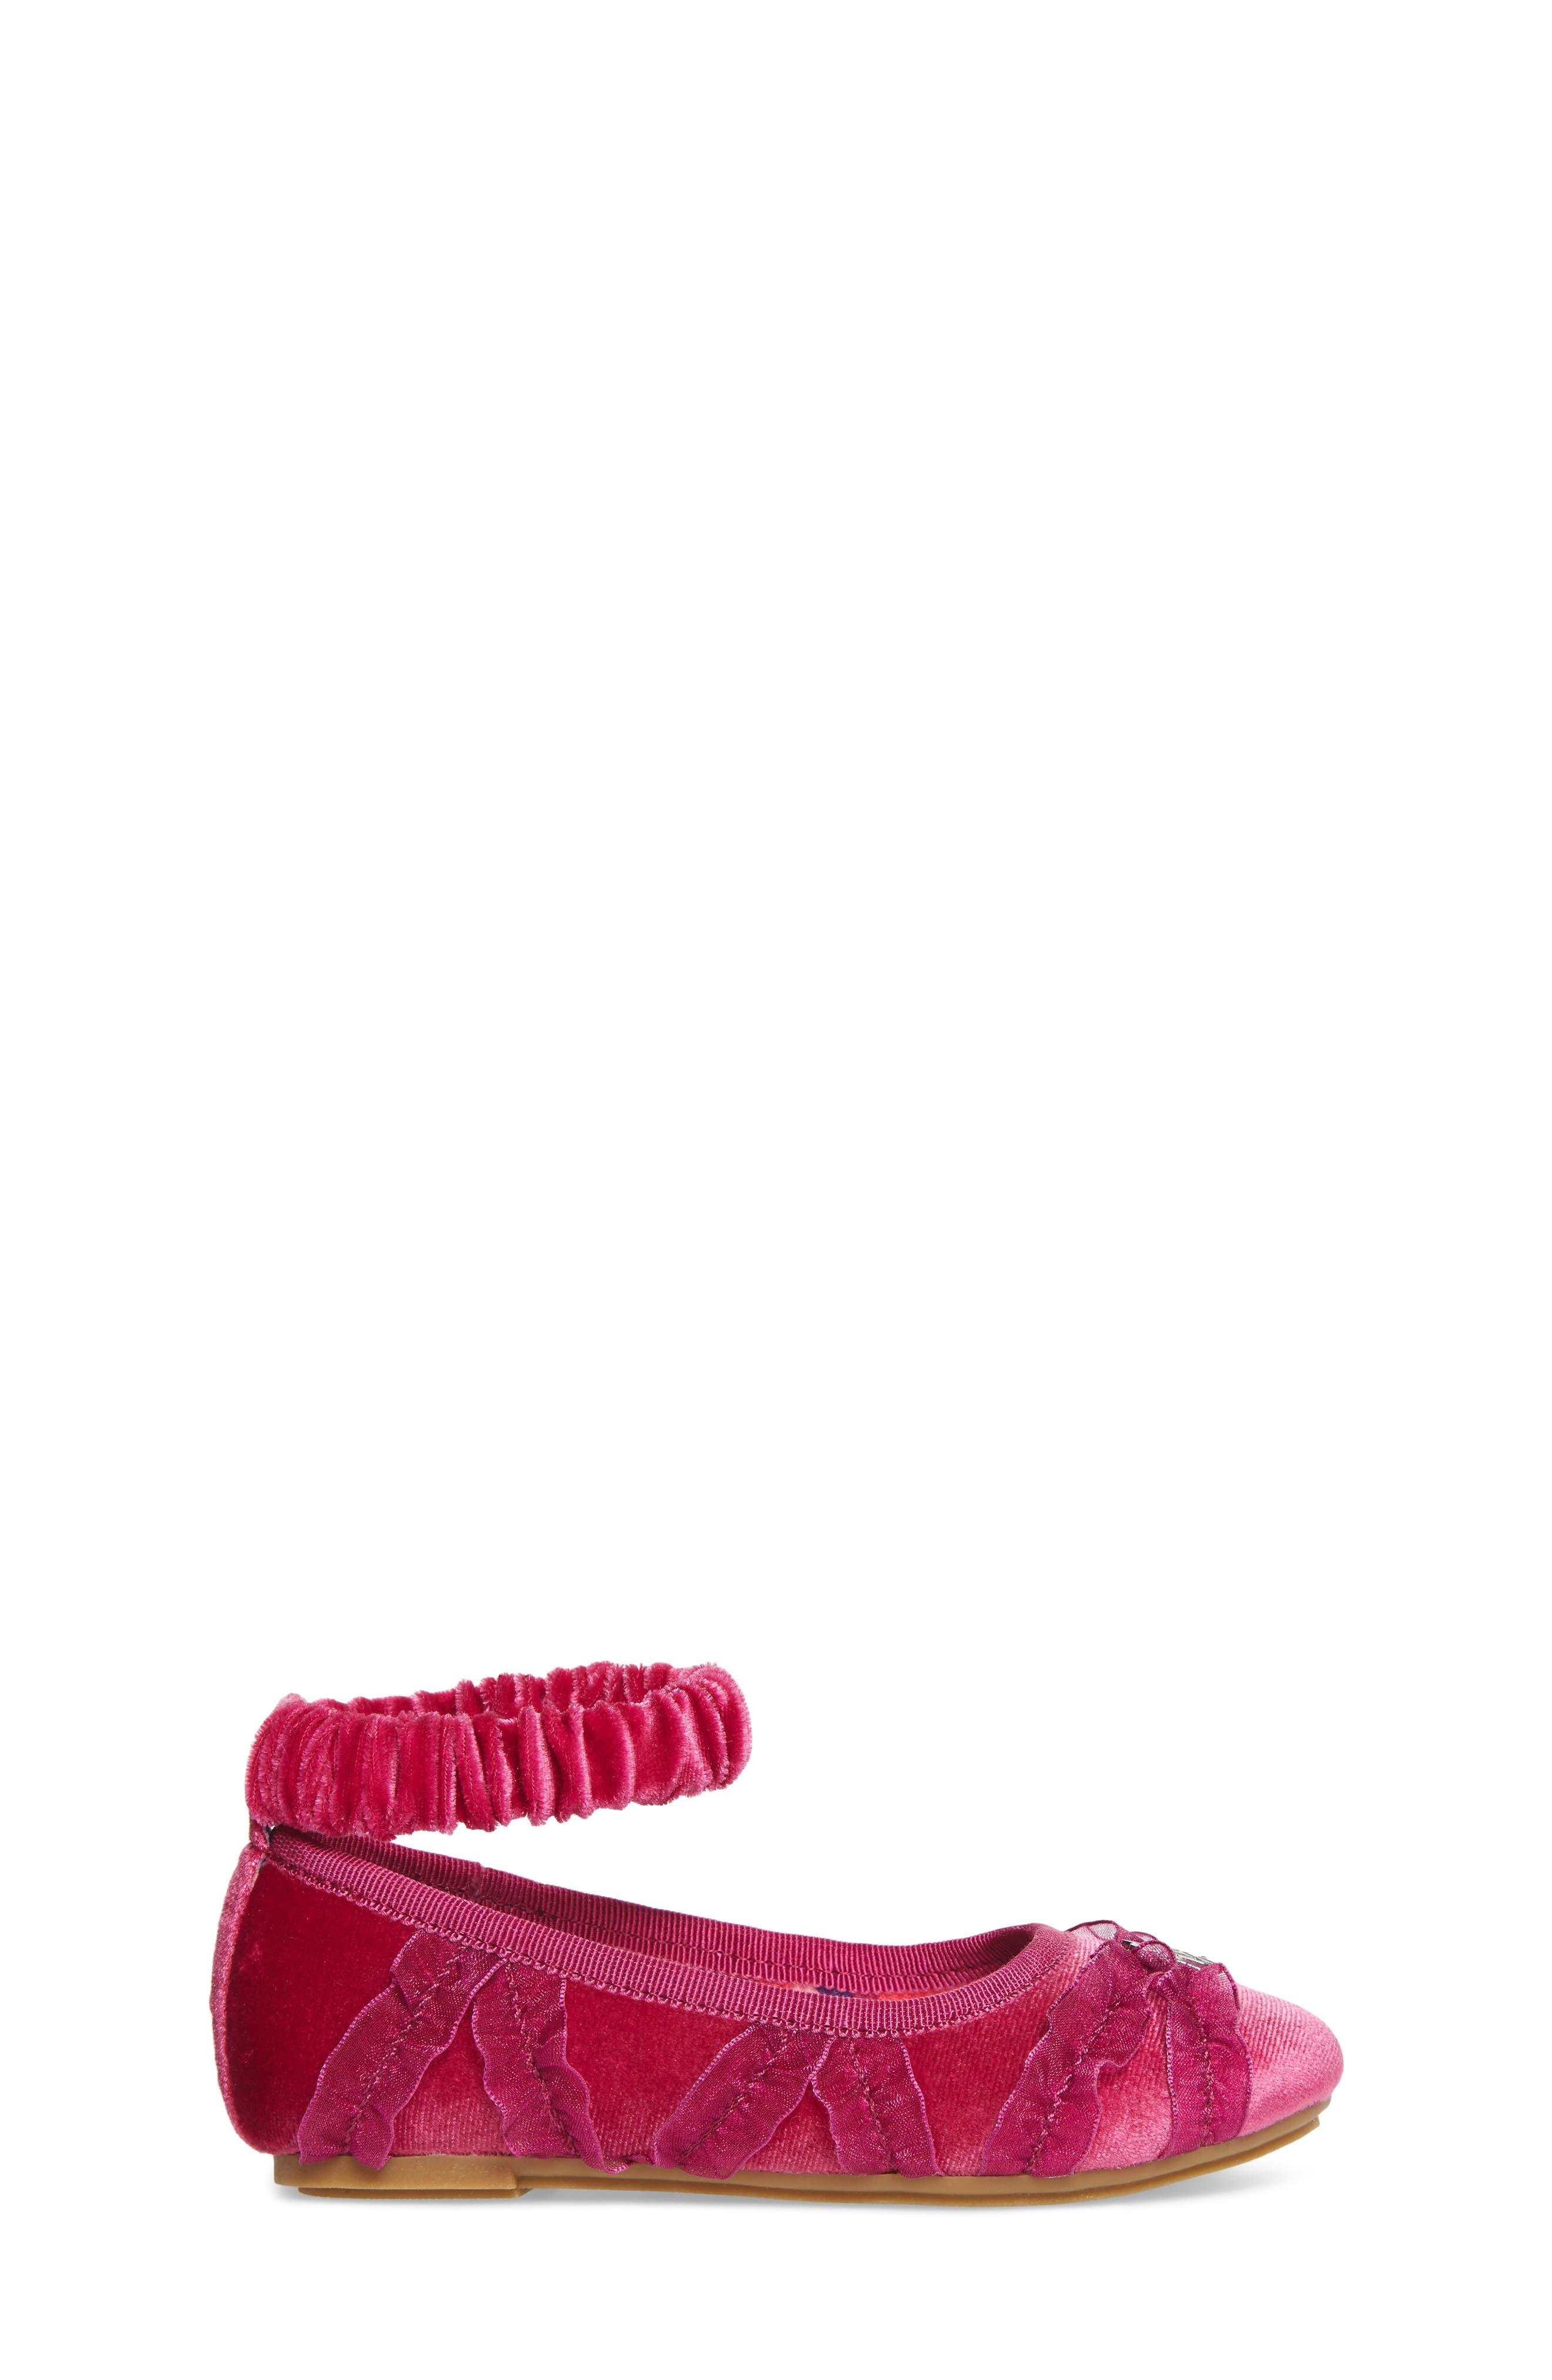 Emerson Ankle Strap Ballet Flat,                             Alternate thumbnail 3, color,